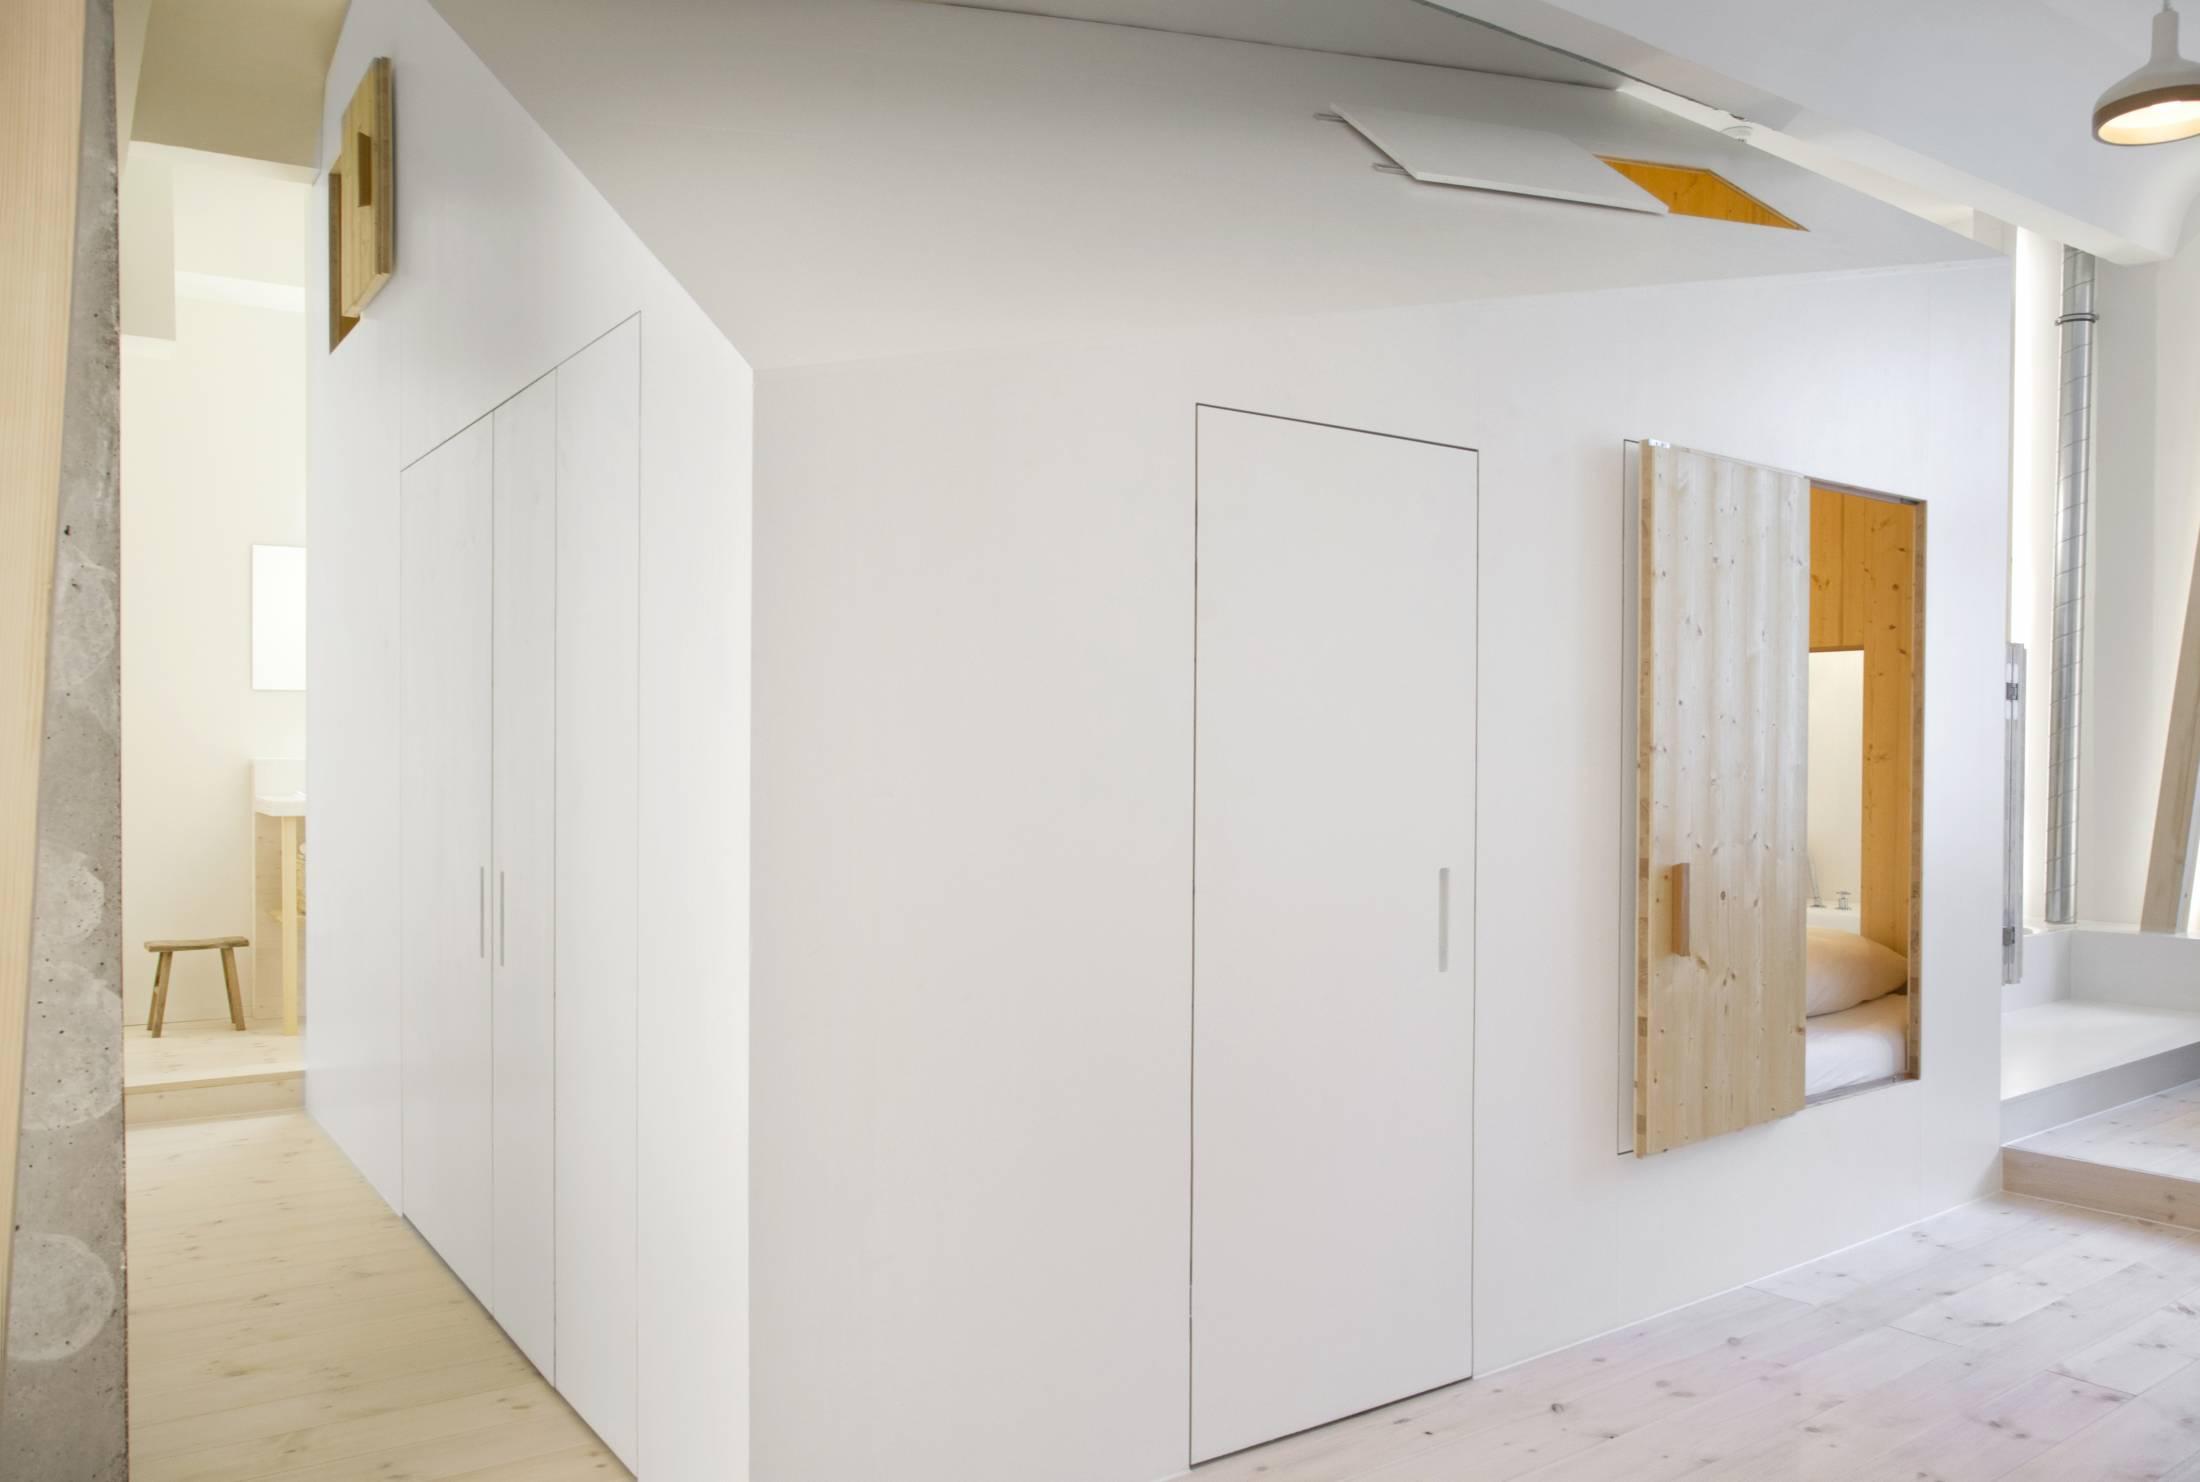 Room-304_Sigurd-Larsen_Michelberger-Hotel_Architecture-Danish-design-berlin_photo-Rita-Lino-1-1100x741@2x.jpg